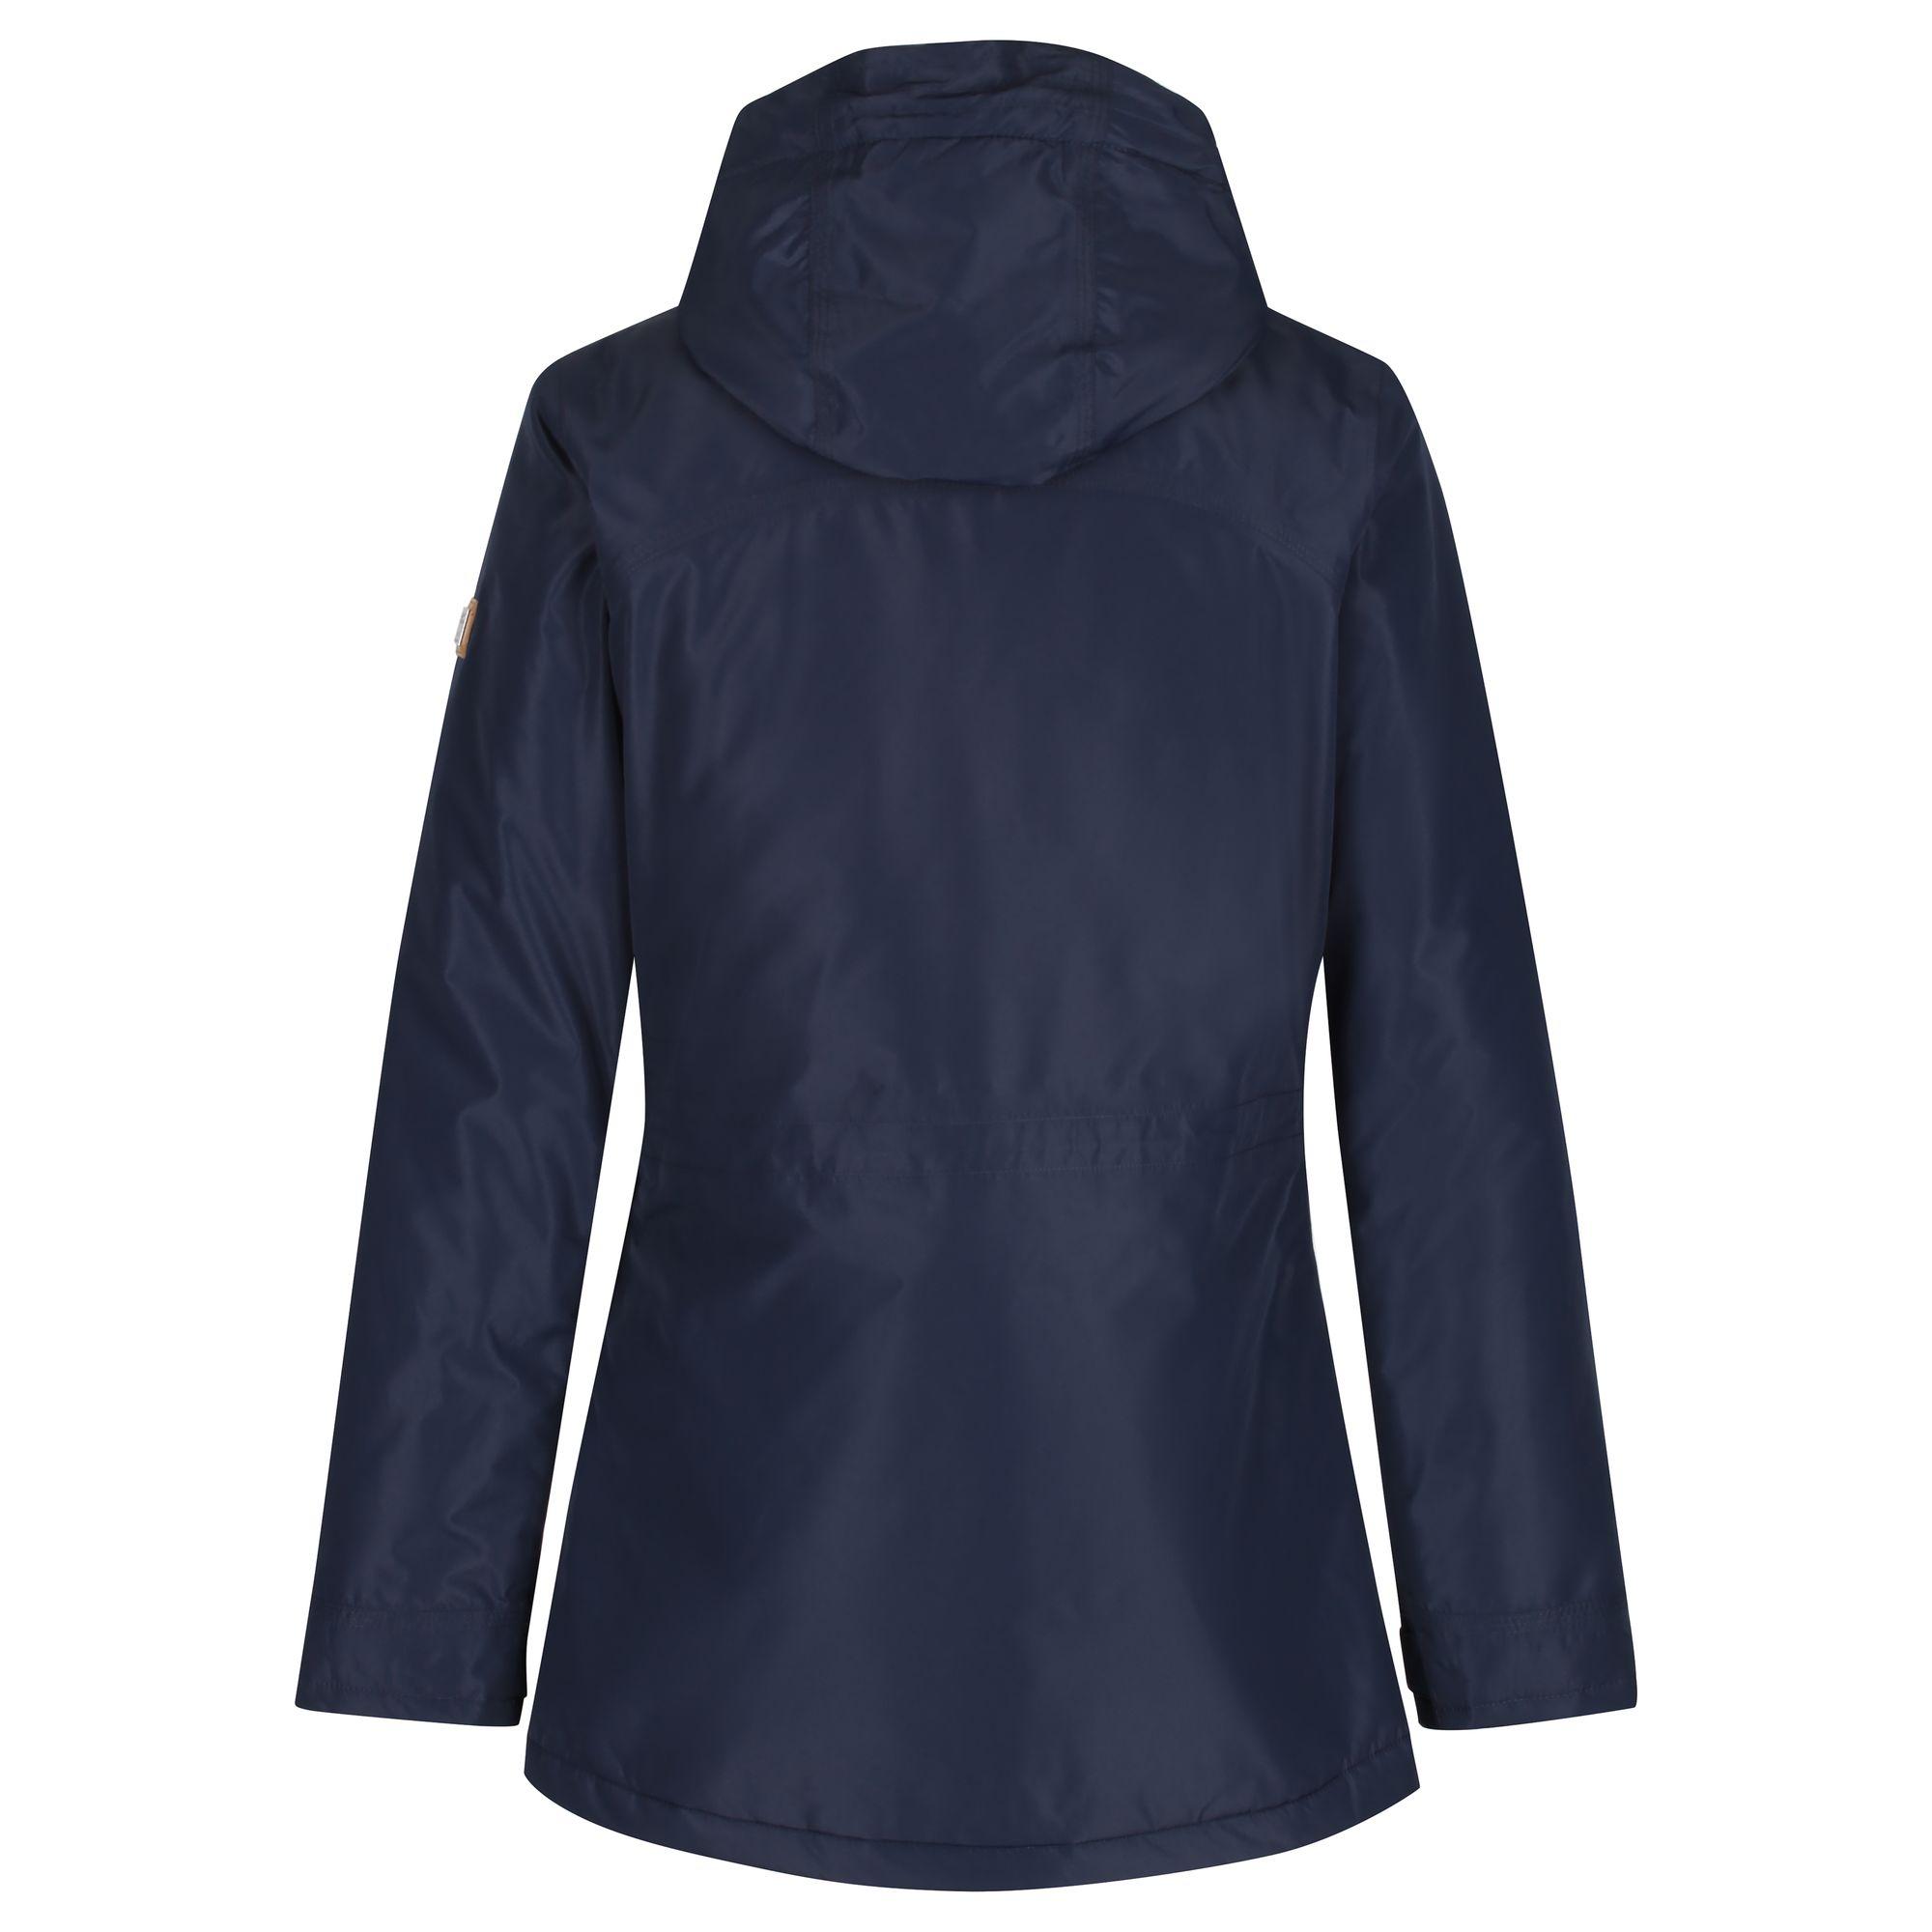 Regatta-Womens-Ladies-Braelynn-Long-Length-Waterproof-Jacket-RG4552 thumbnail 19